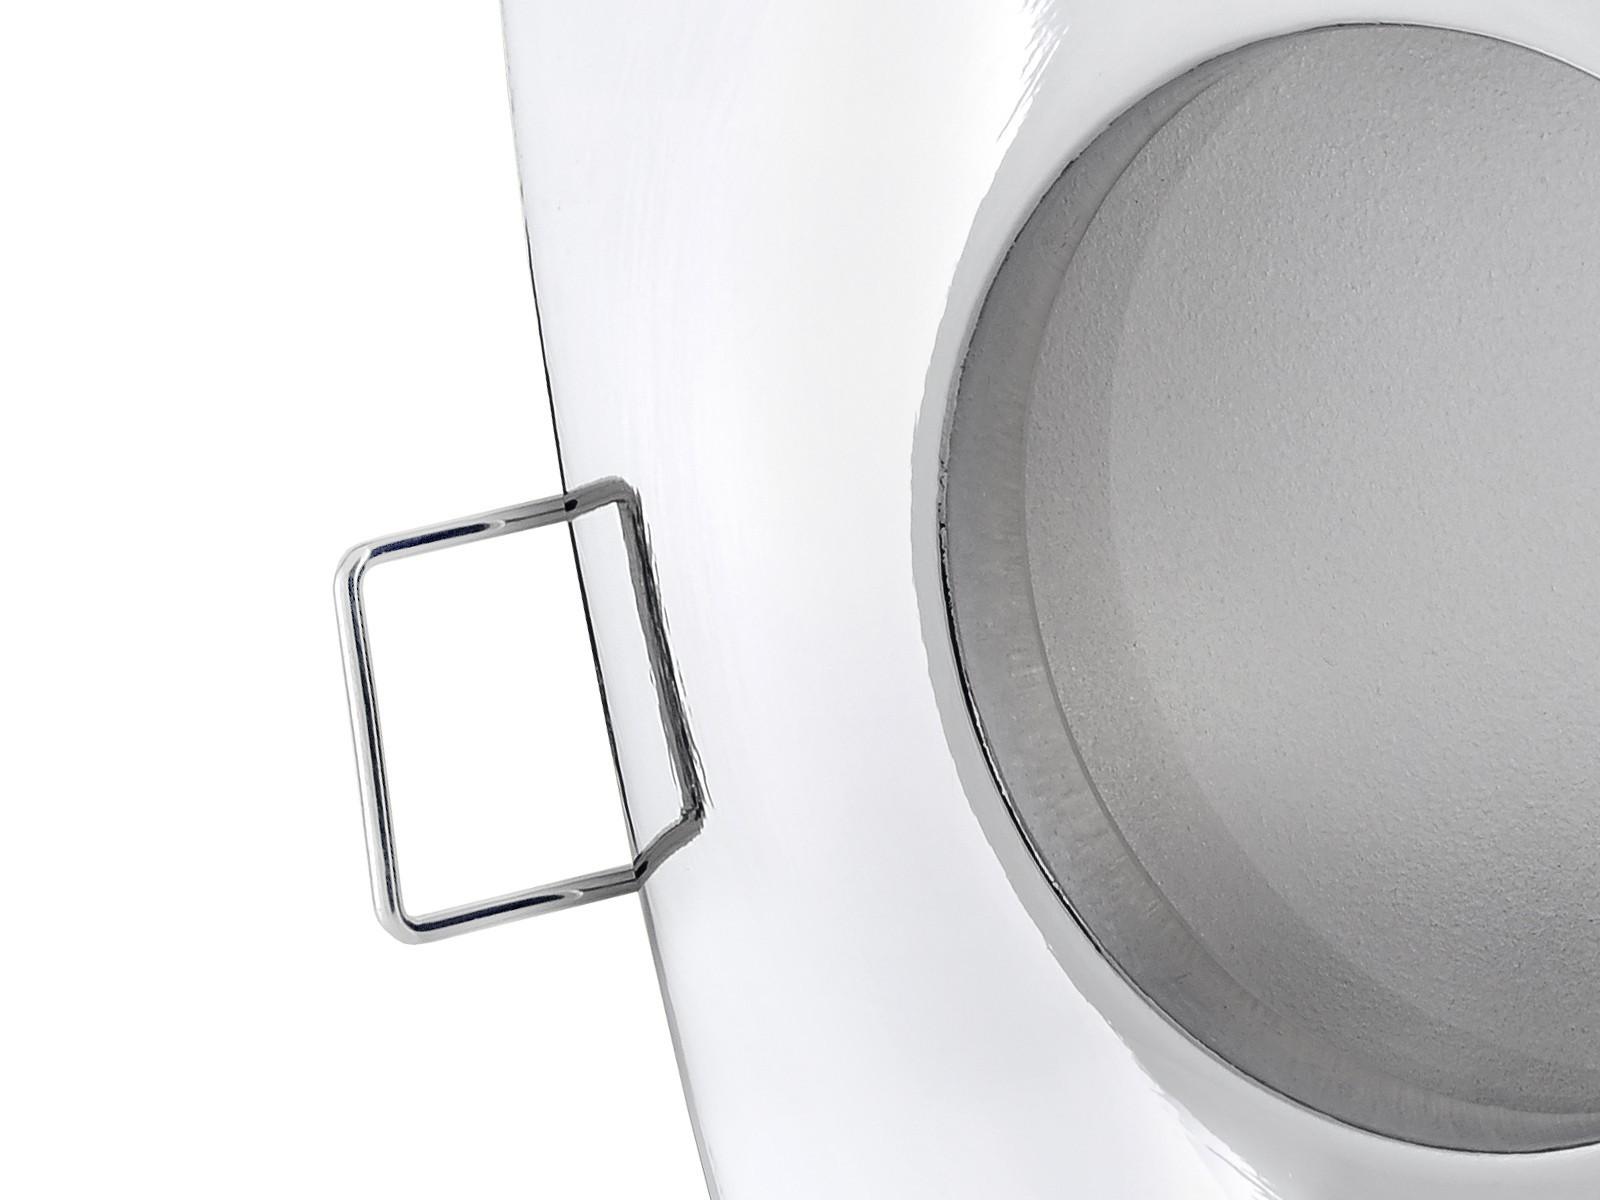 QW-1-chrom-detail-1600x1200 Fabelhafte Feuchtraum Led Einbaustrahler 230v Dekorationen